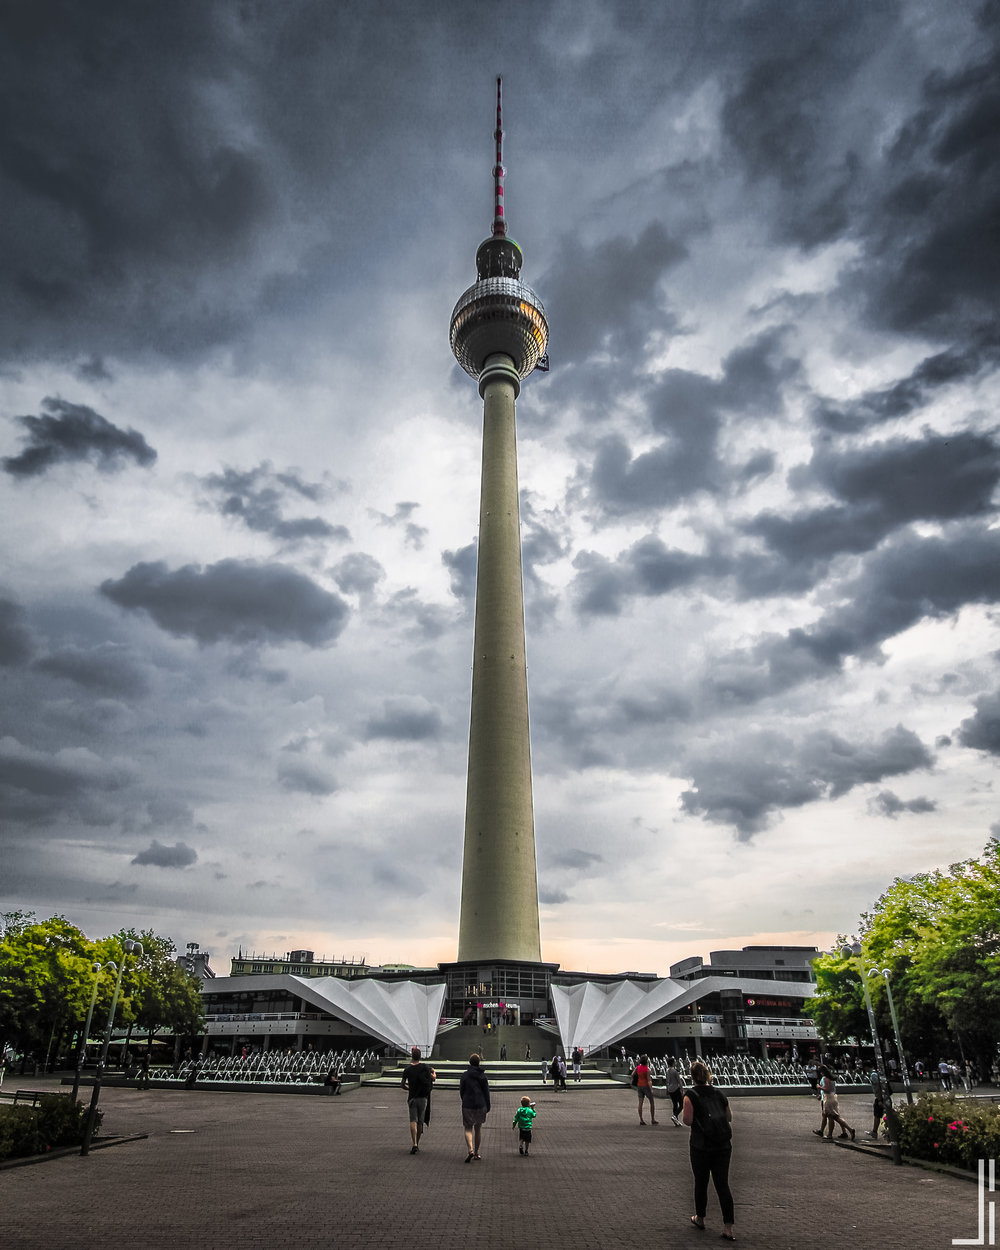 Fernsehturm Berlijn - jbax